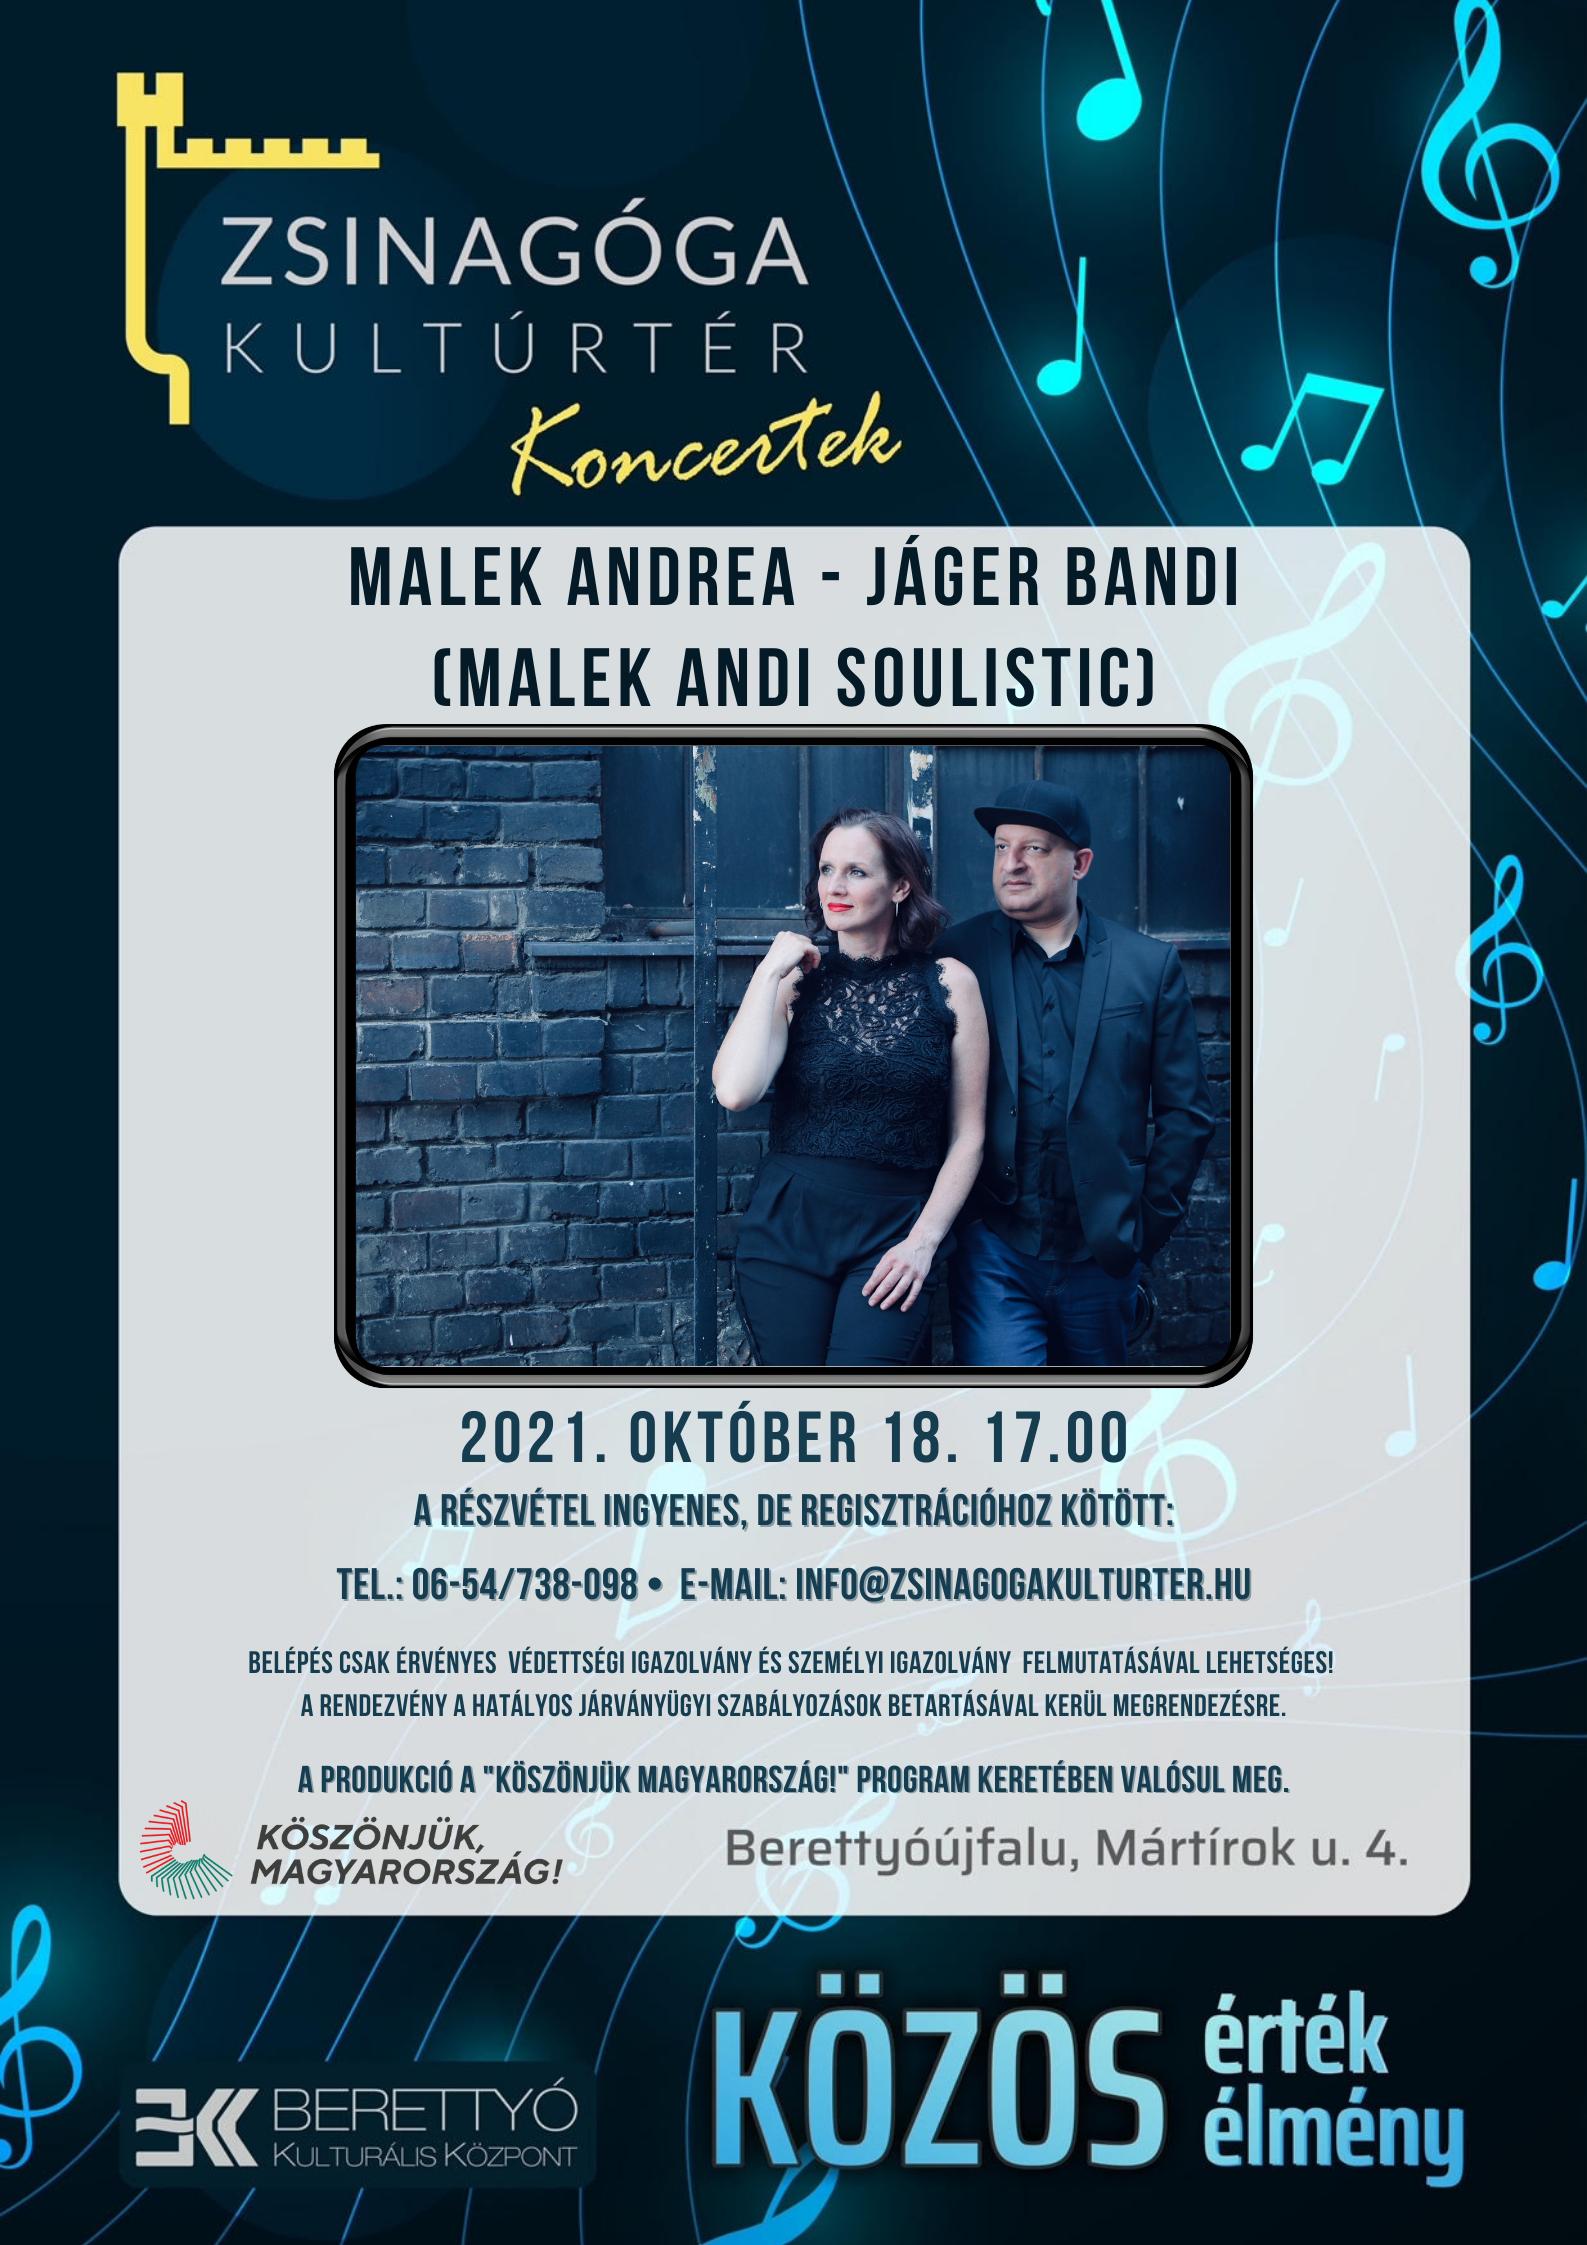 Malek Andrea - Jáger Bandi (Malek Andi Soulistic) Koncert